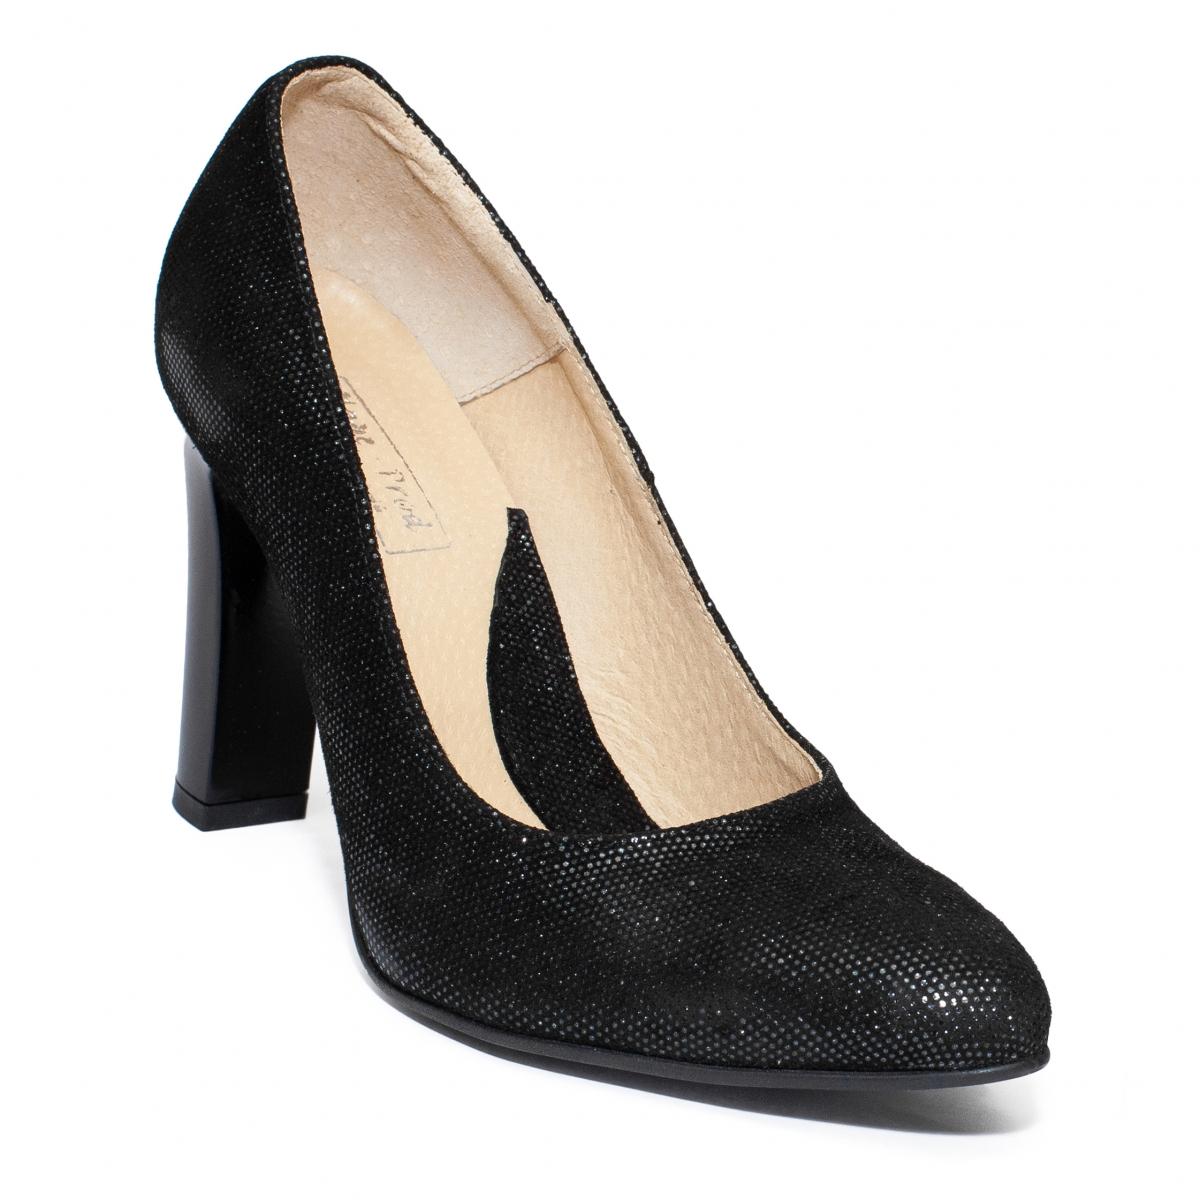 Pantofi dama piele cu toc 040 negru elegant 34-41